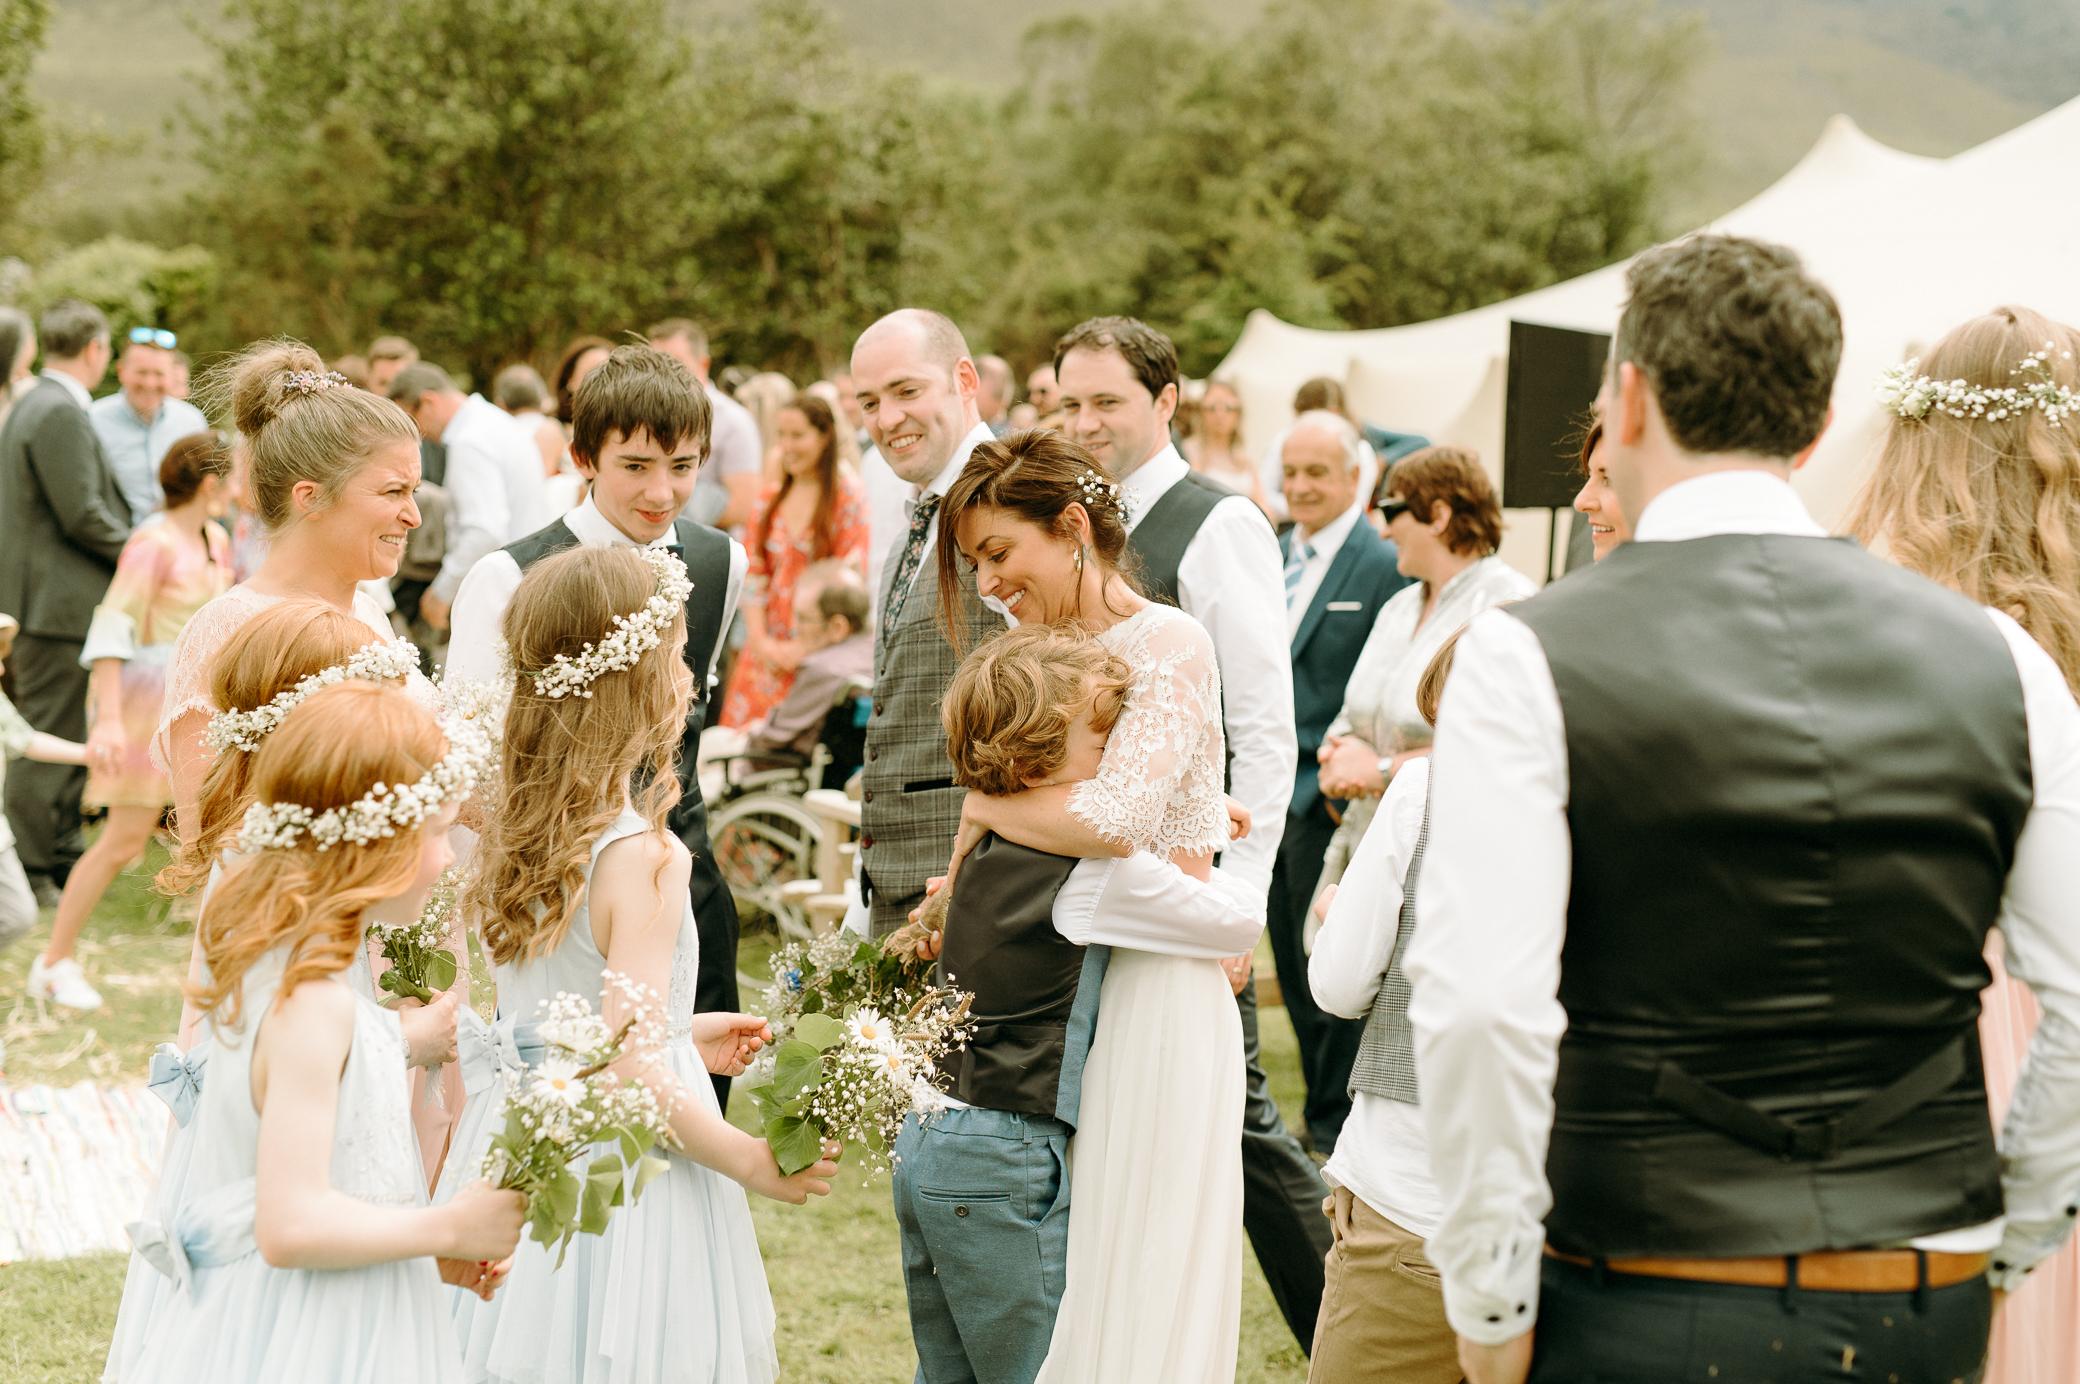 Carmel&Marcus_Wedding photographer Europe-62.jpg